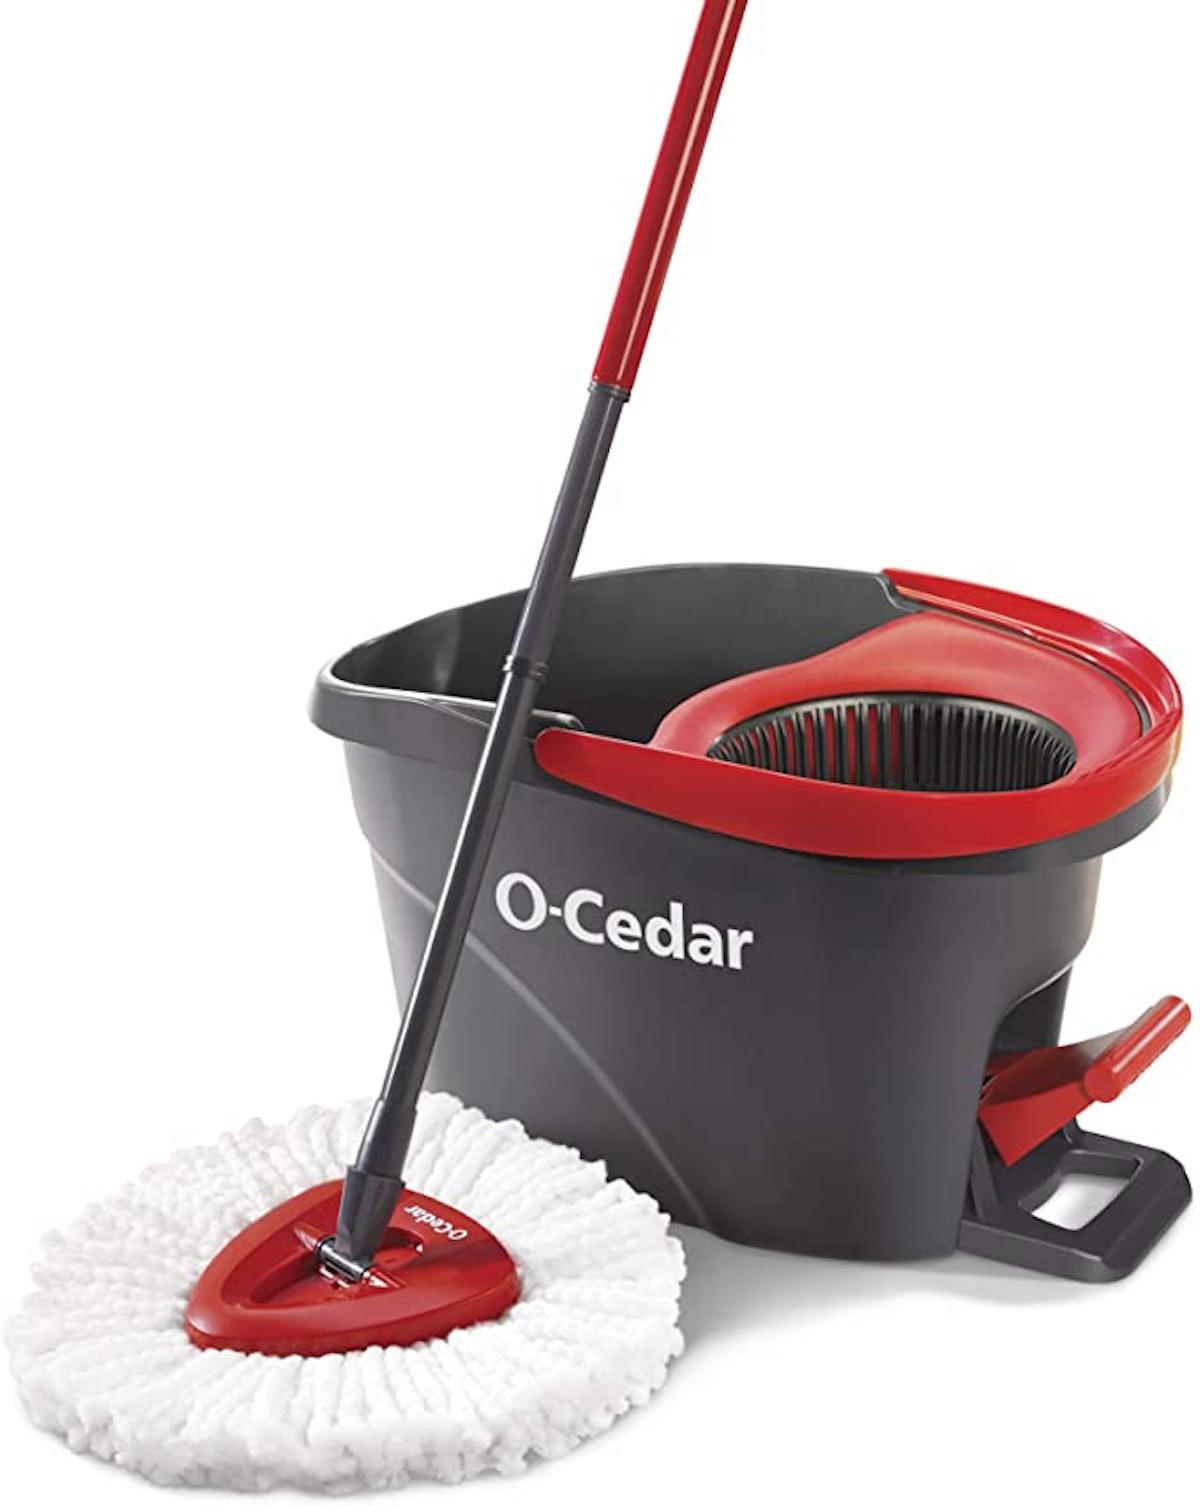 O-Cedar EasyWring Mop and Bucket